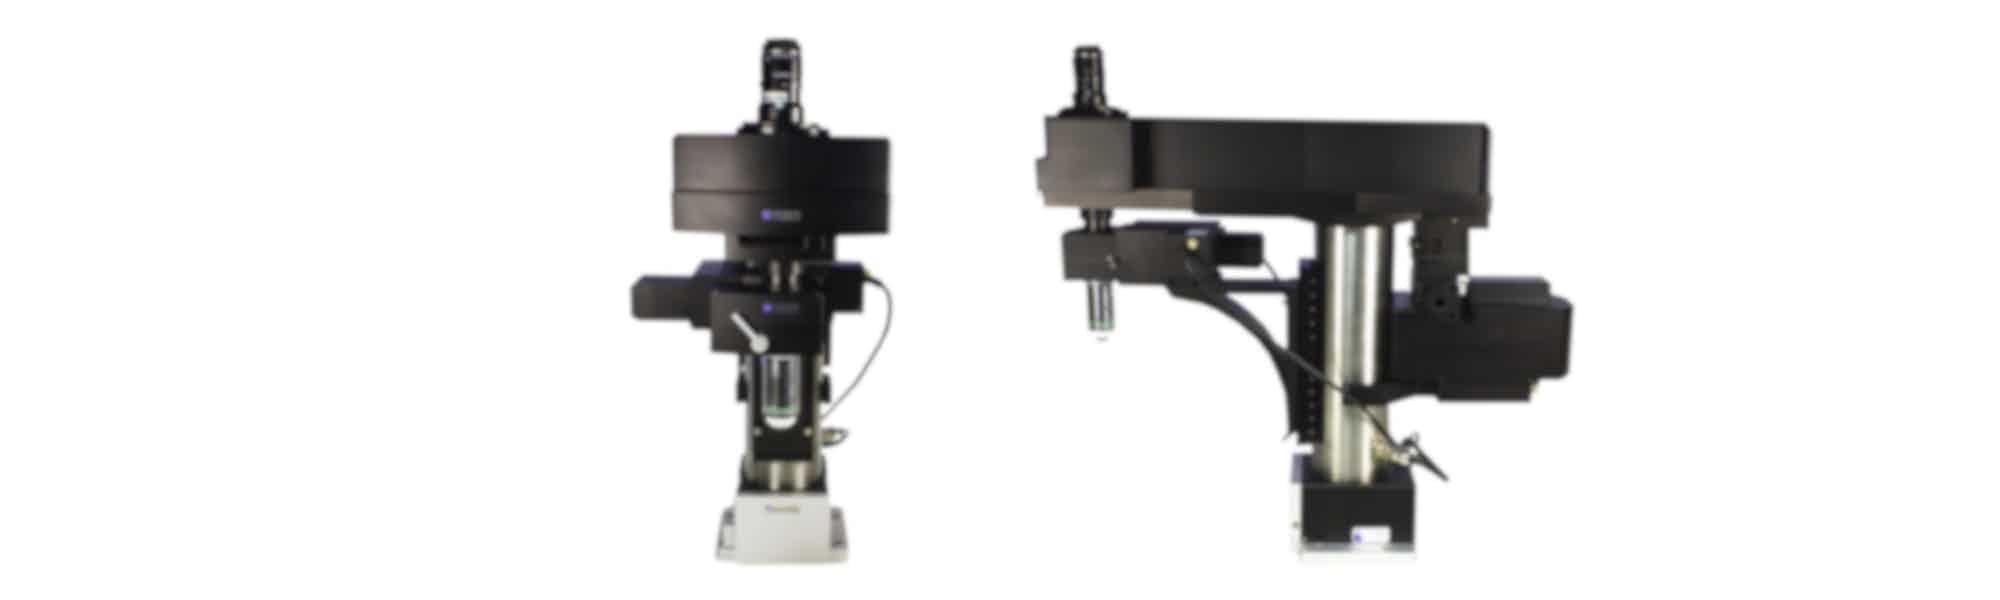 Scientifica VivoScope